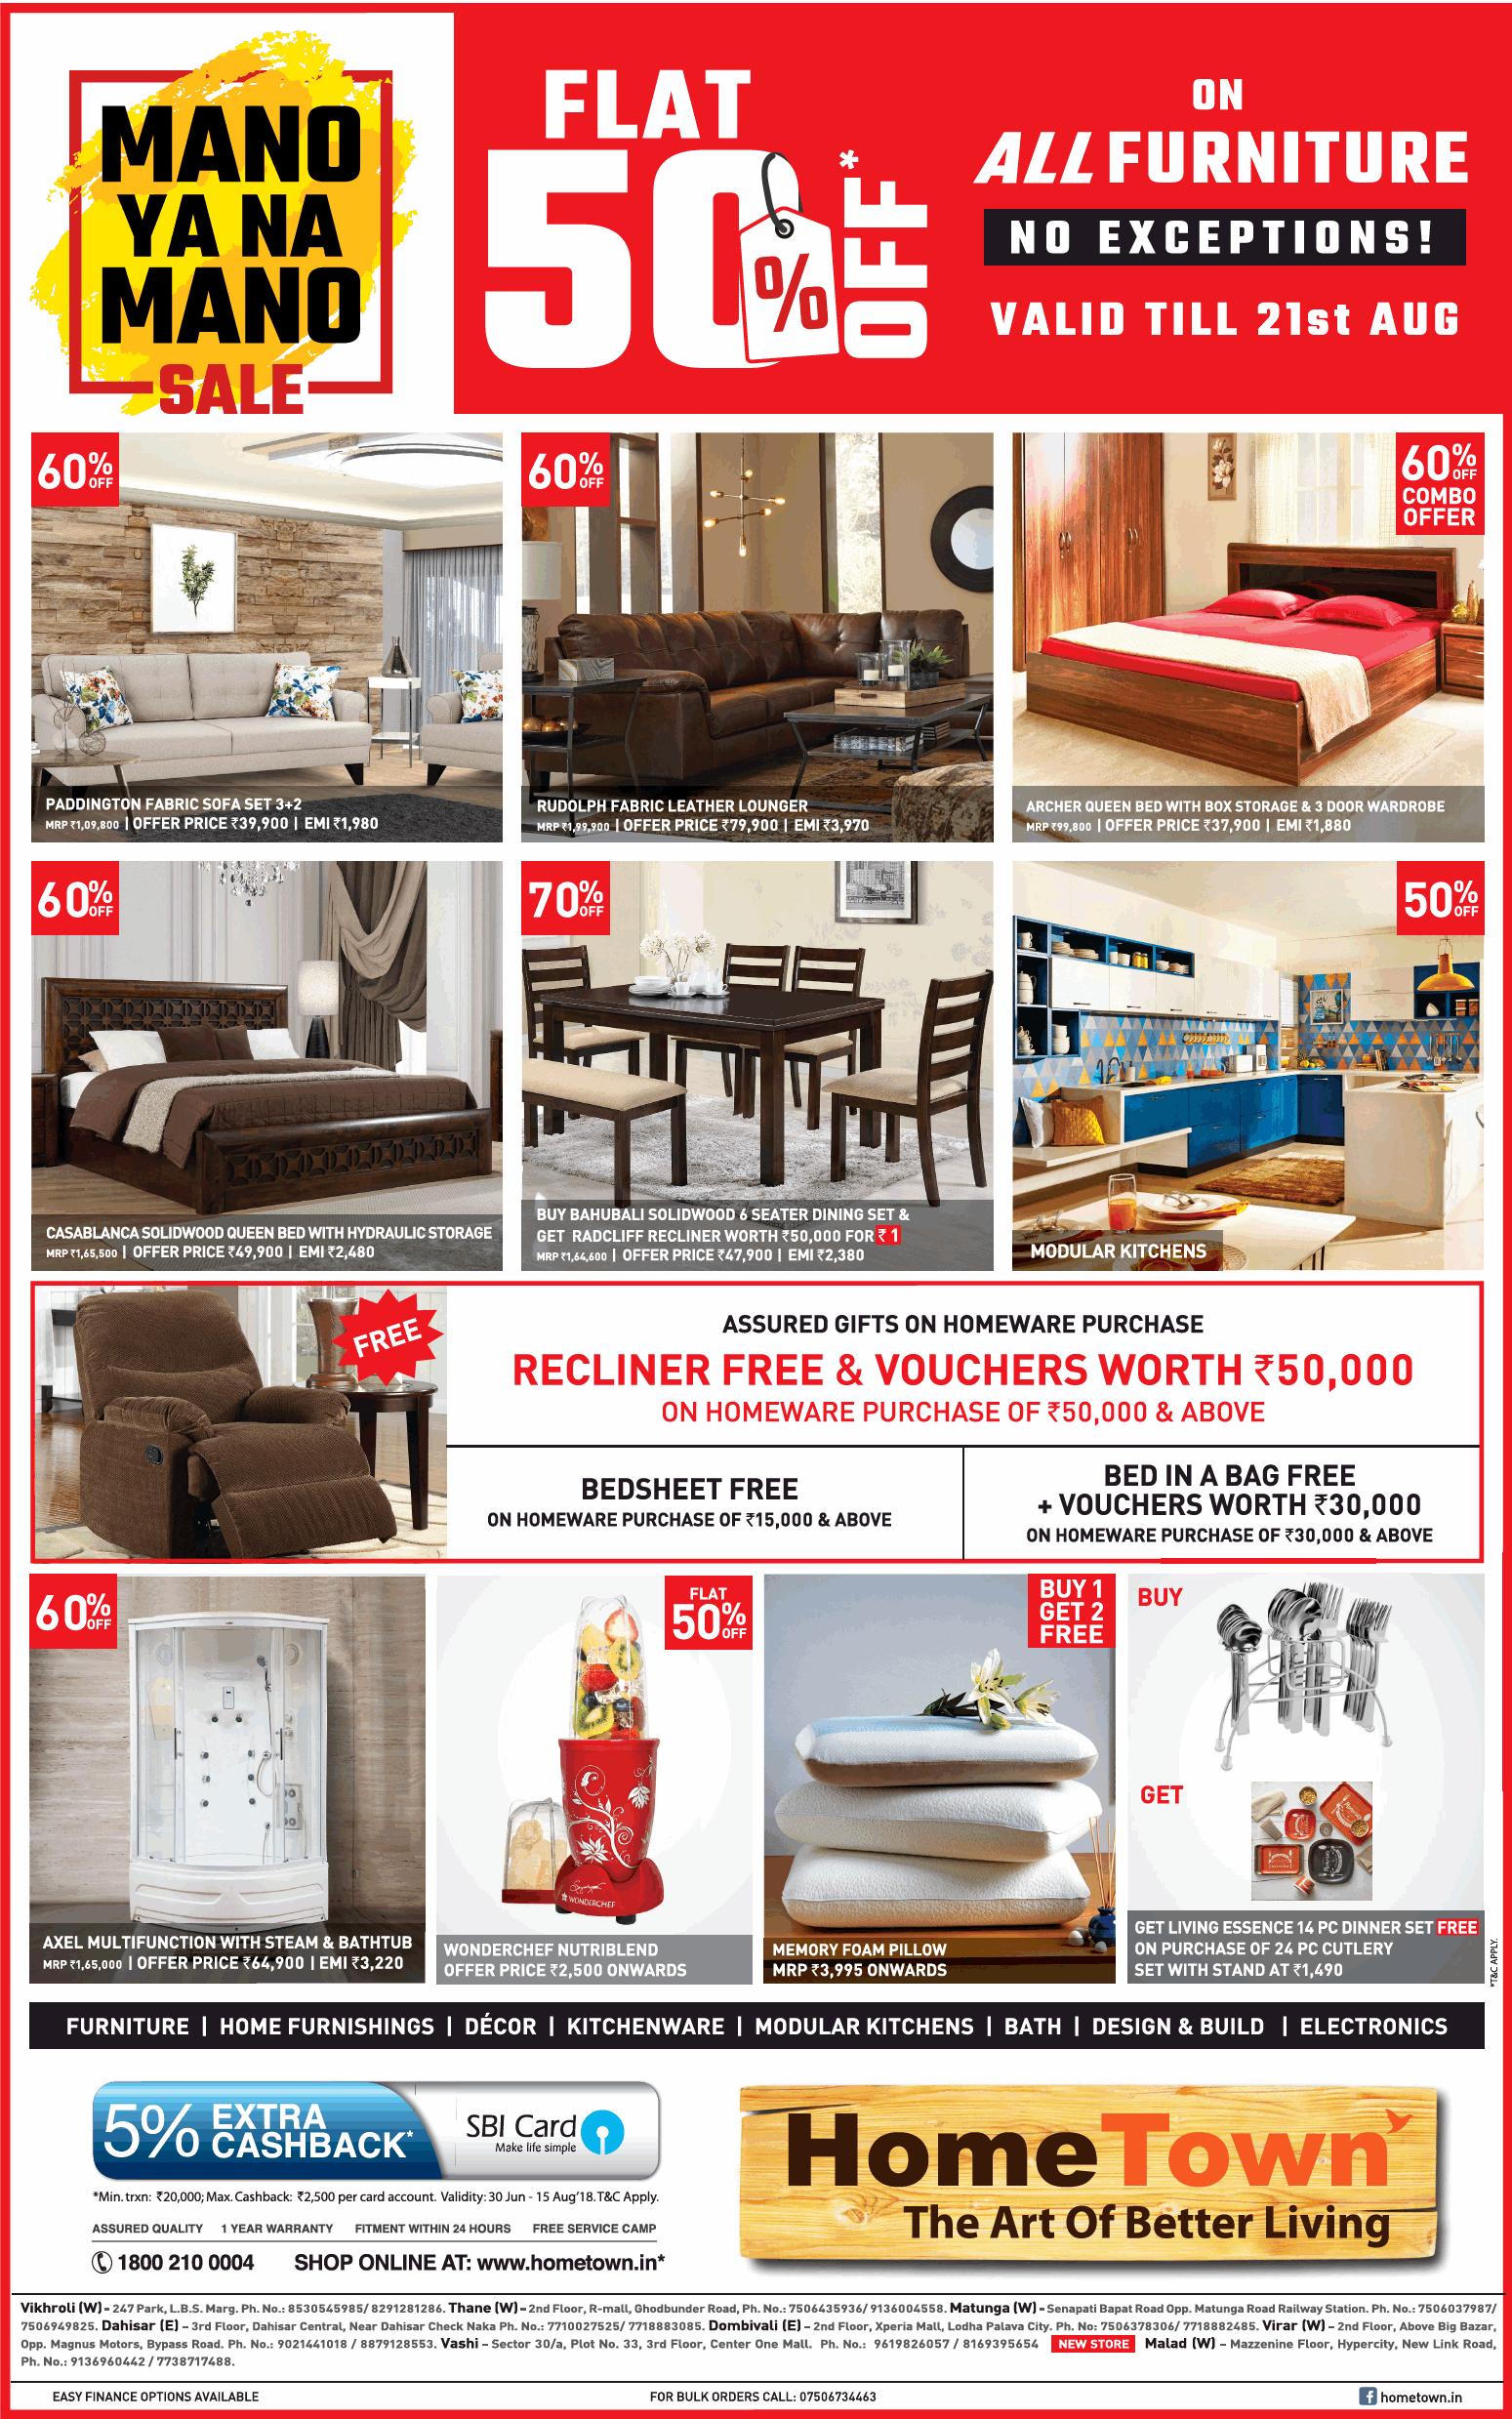 Hometown Furniture Flat 50 Off Ad Advert Gallery